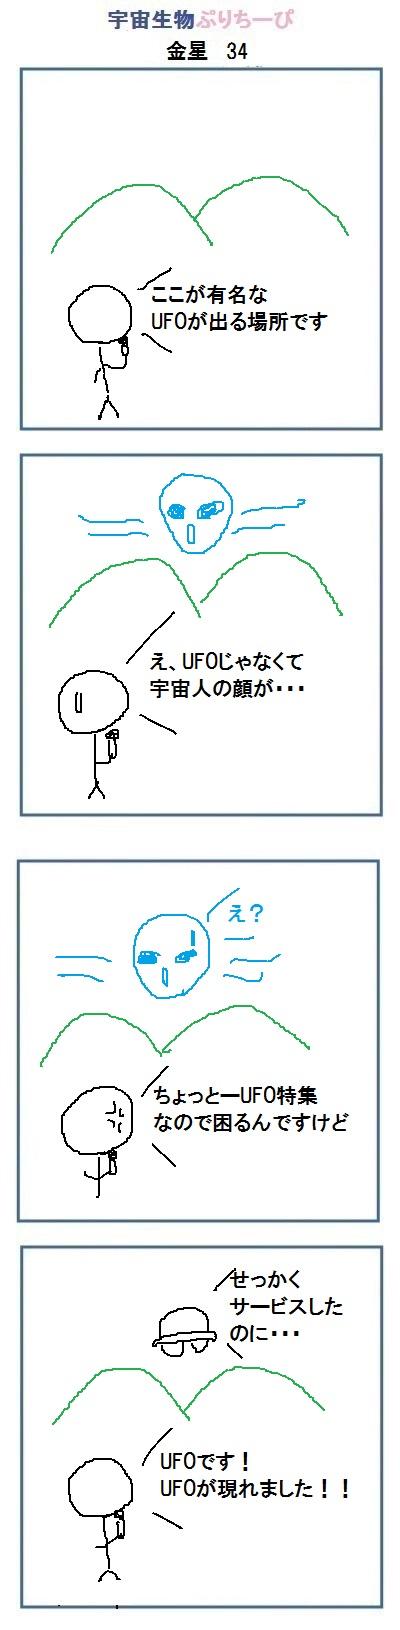 160630_kinsei34.jpg